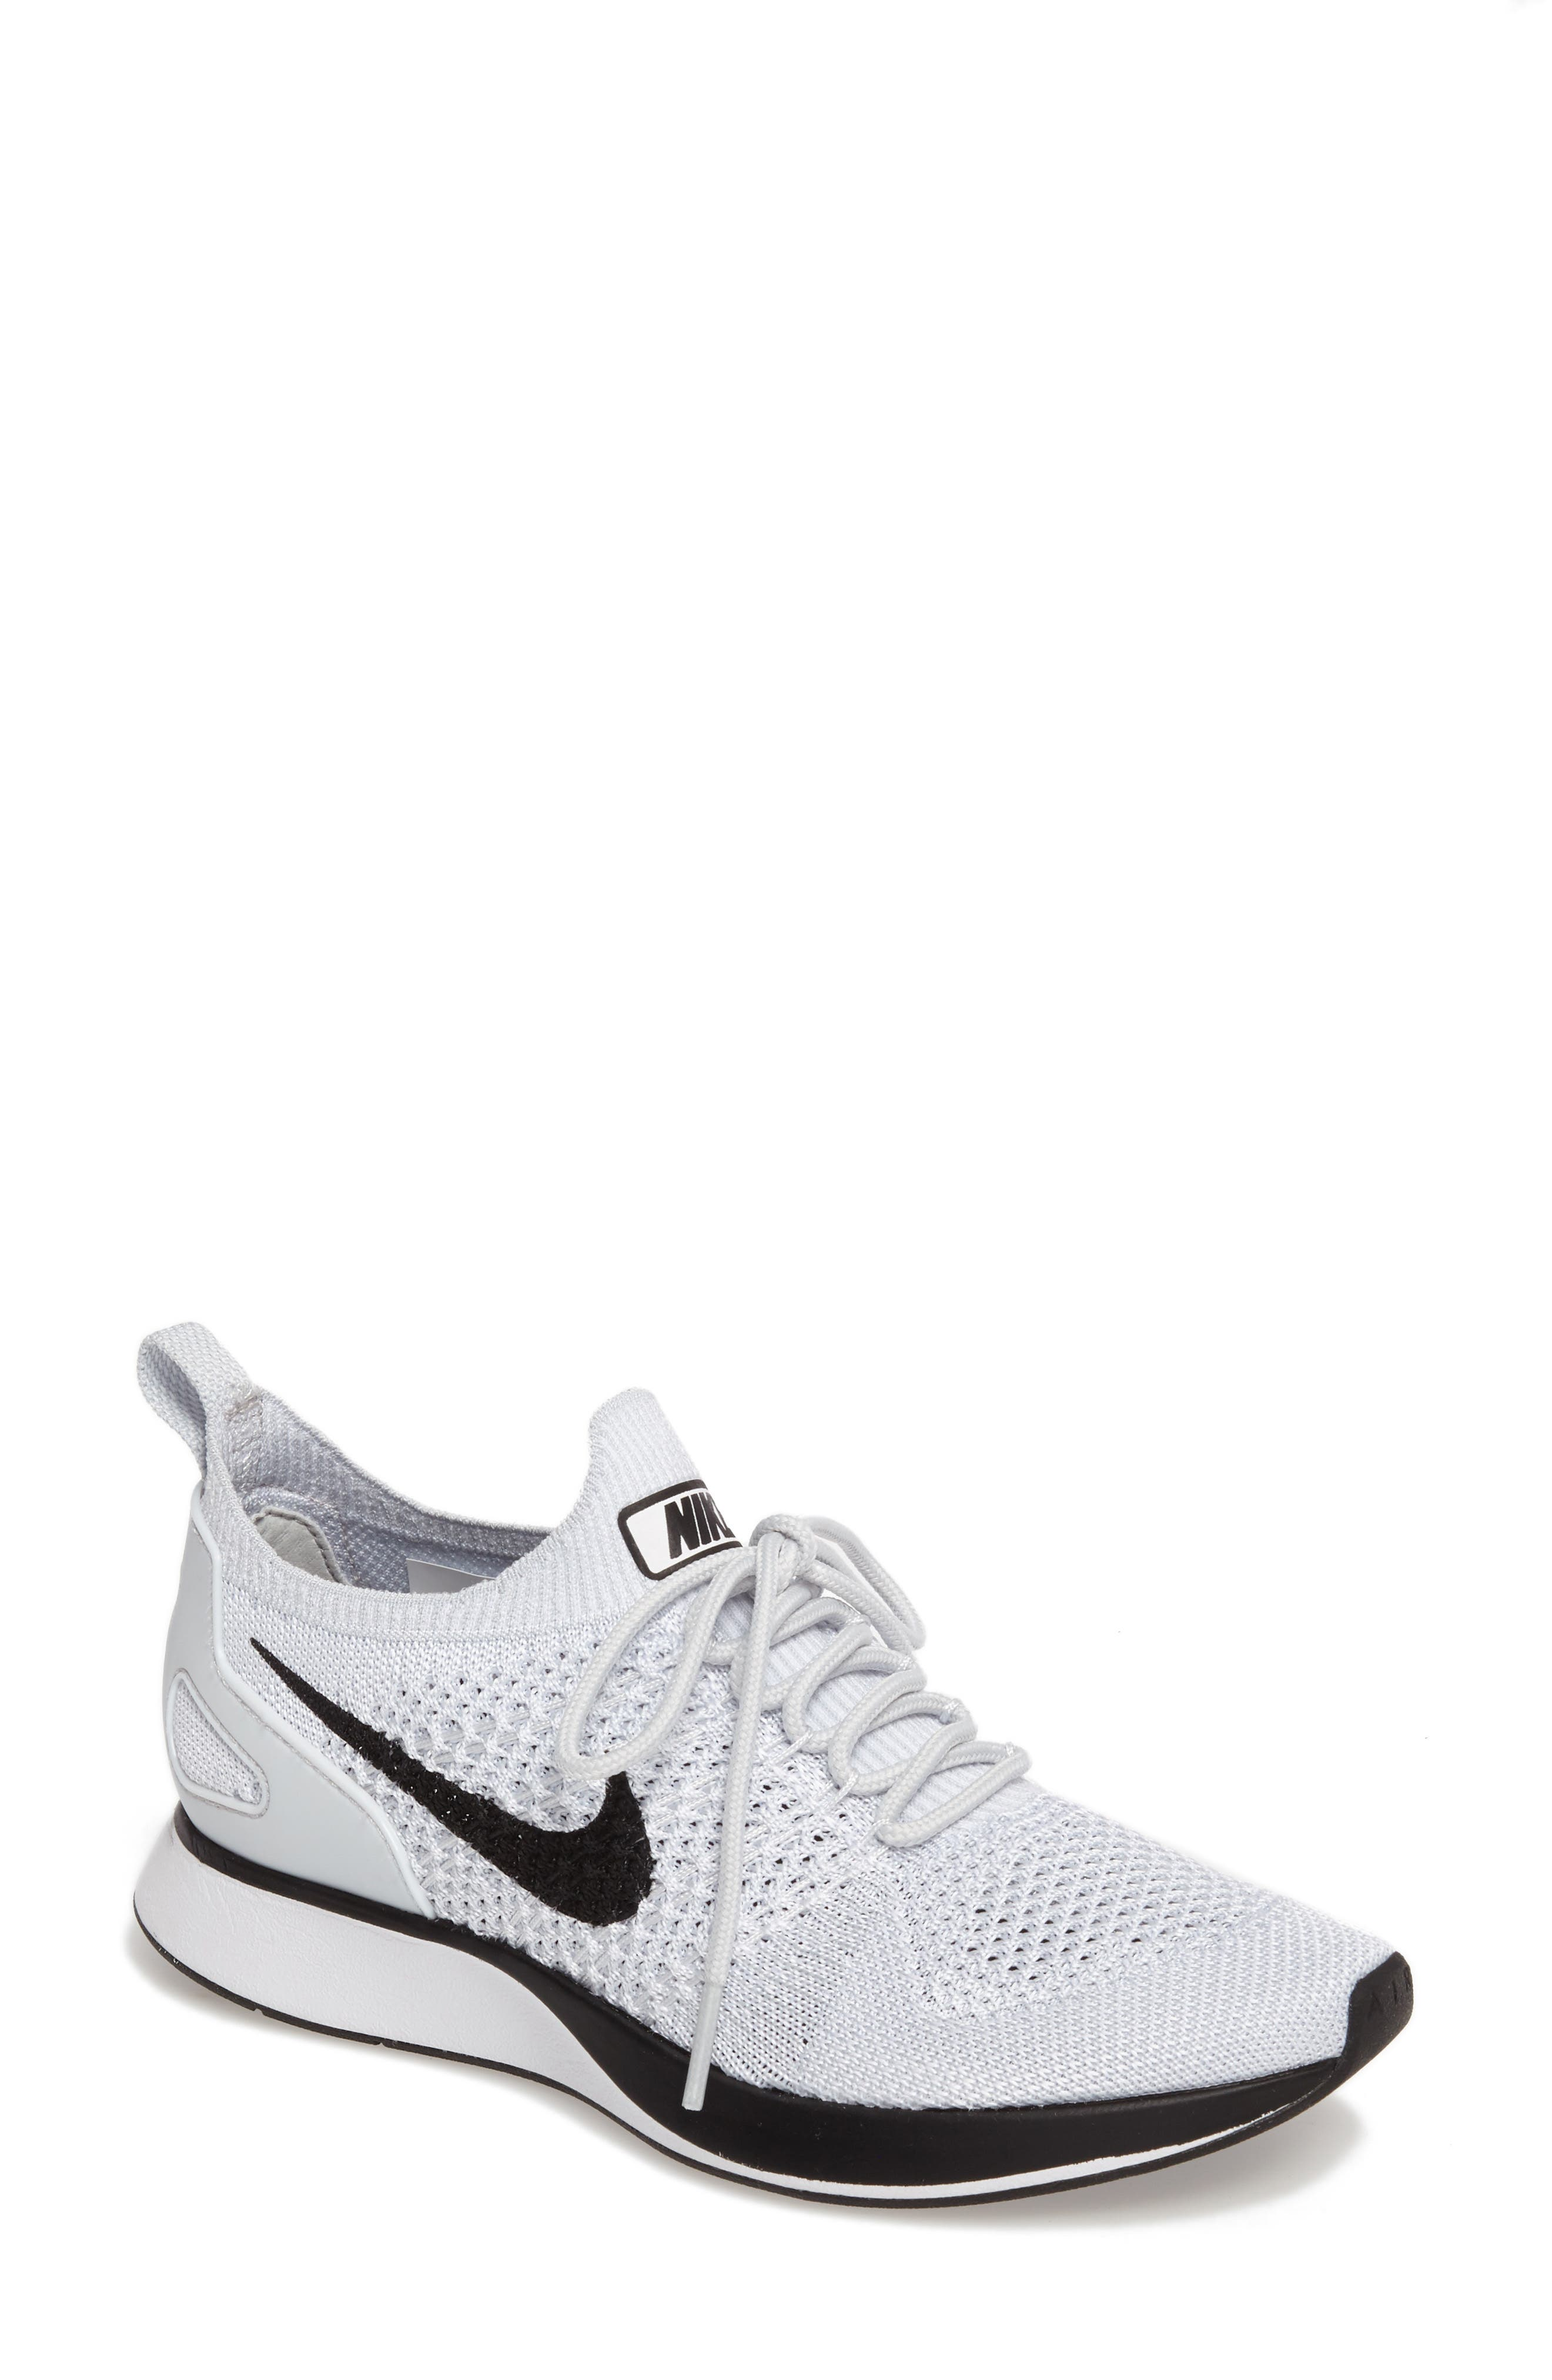 Alternate Image 1 Selected - Nike Zoom Mariah Flyknit Racer Premium Sneaker (Women)